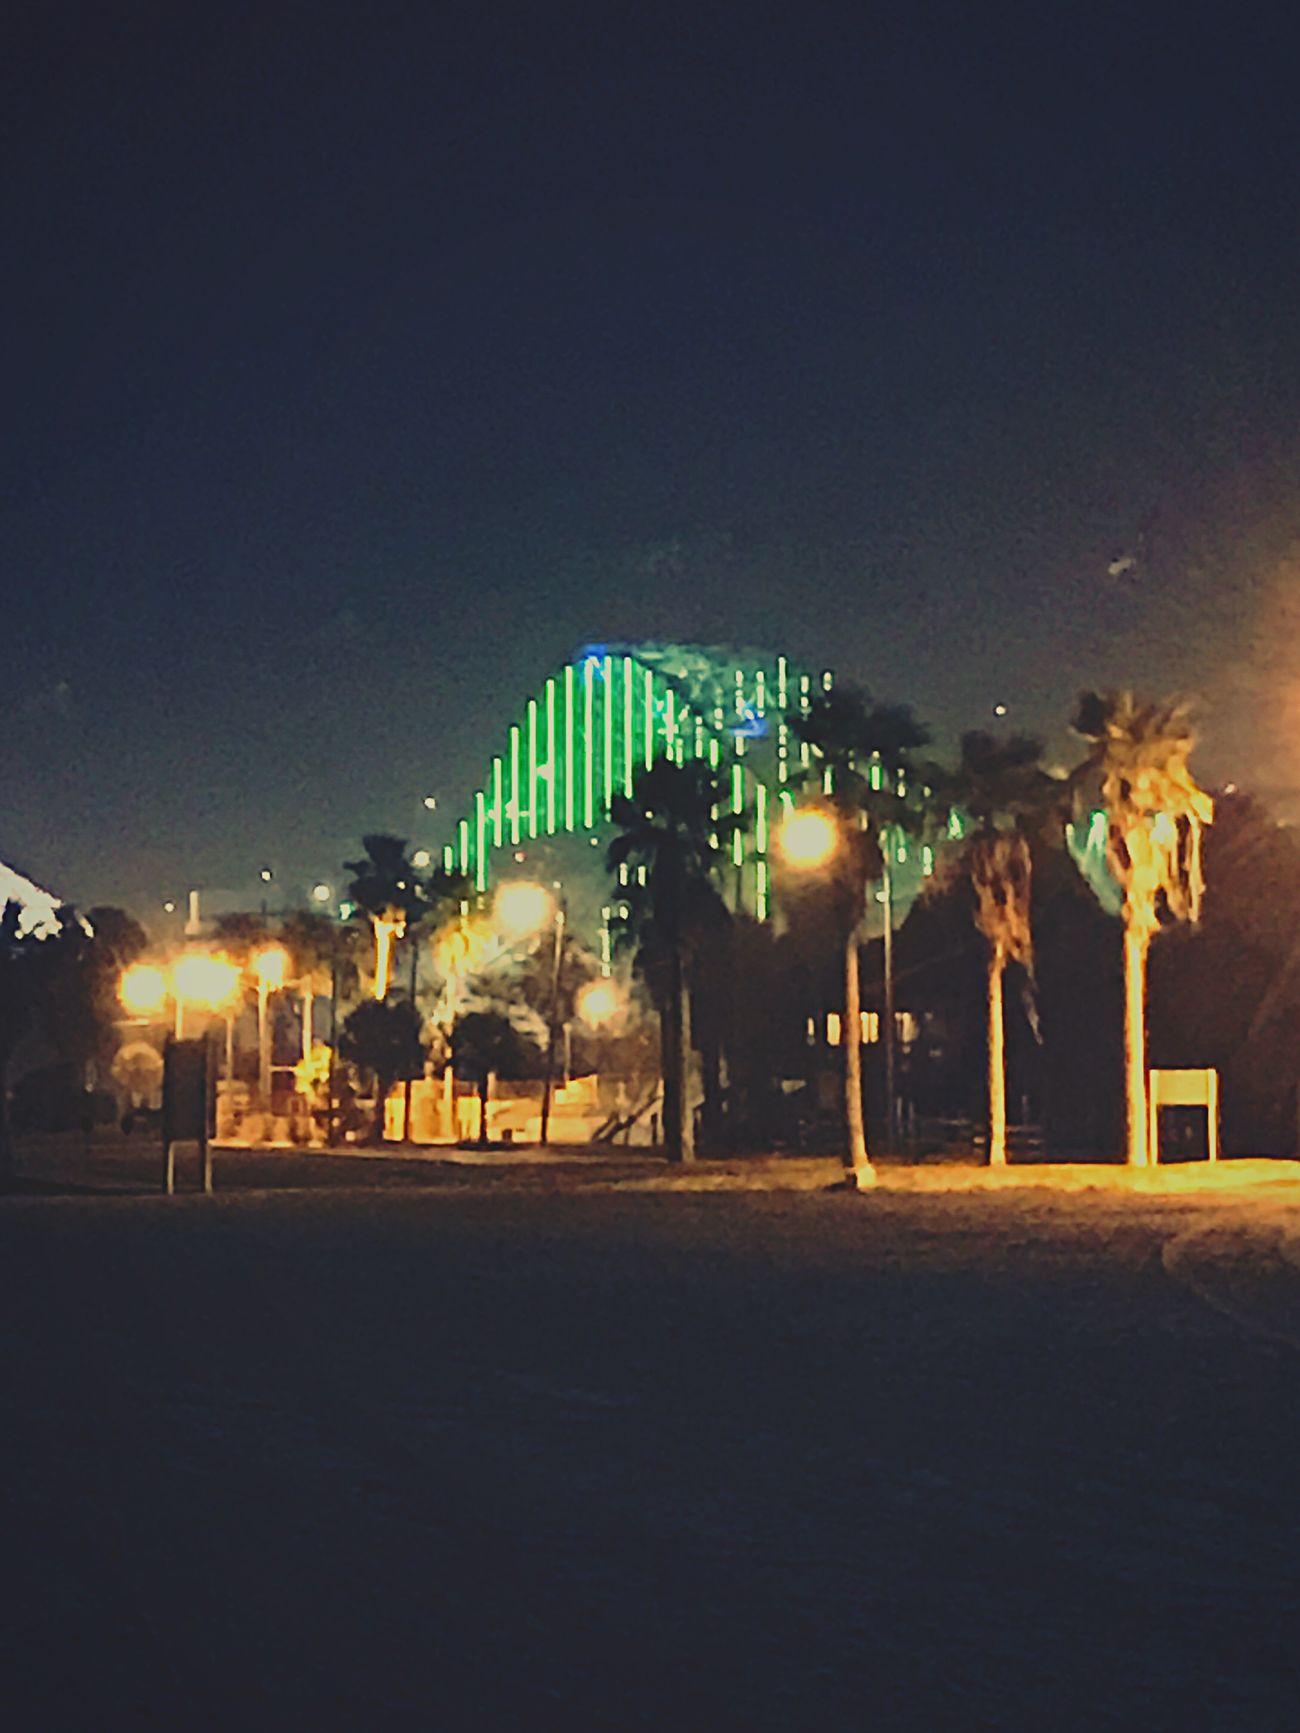 Nice. Illuminated Night Architecture No People Beach EyeEmNewInHere EyeEmNewHere